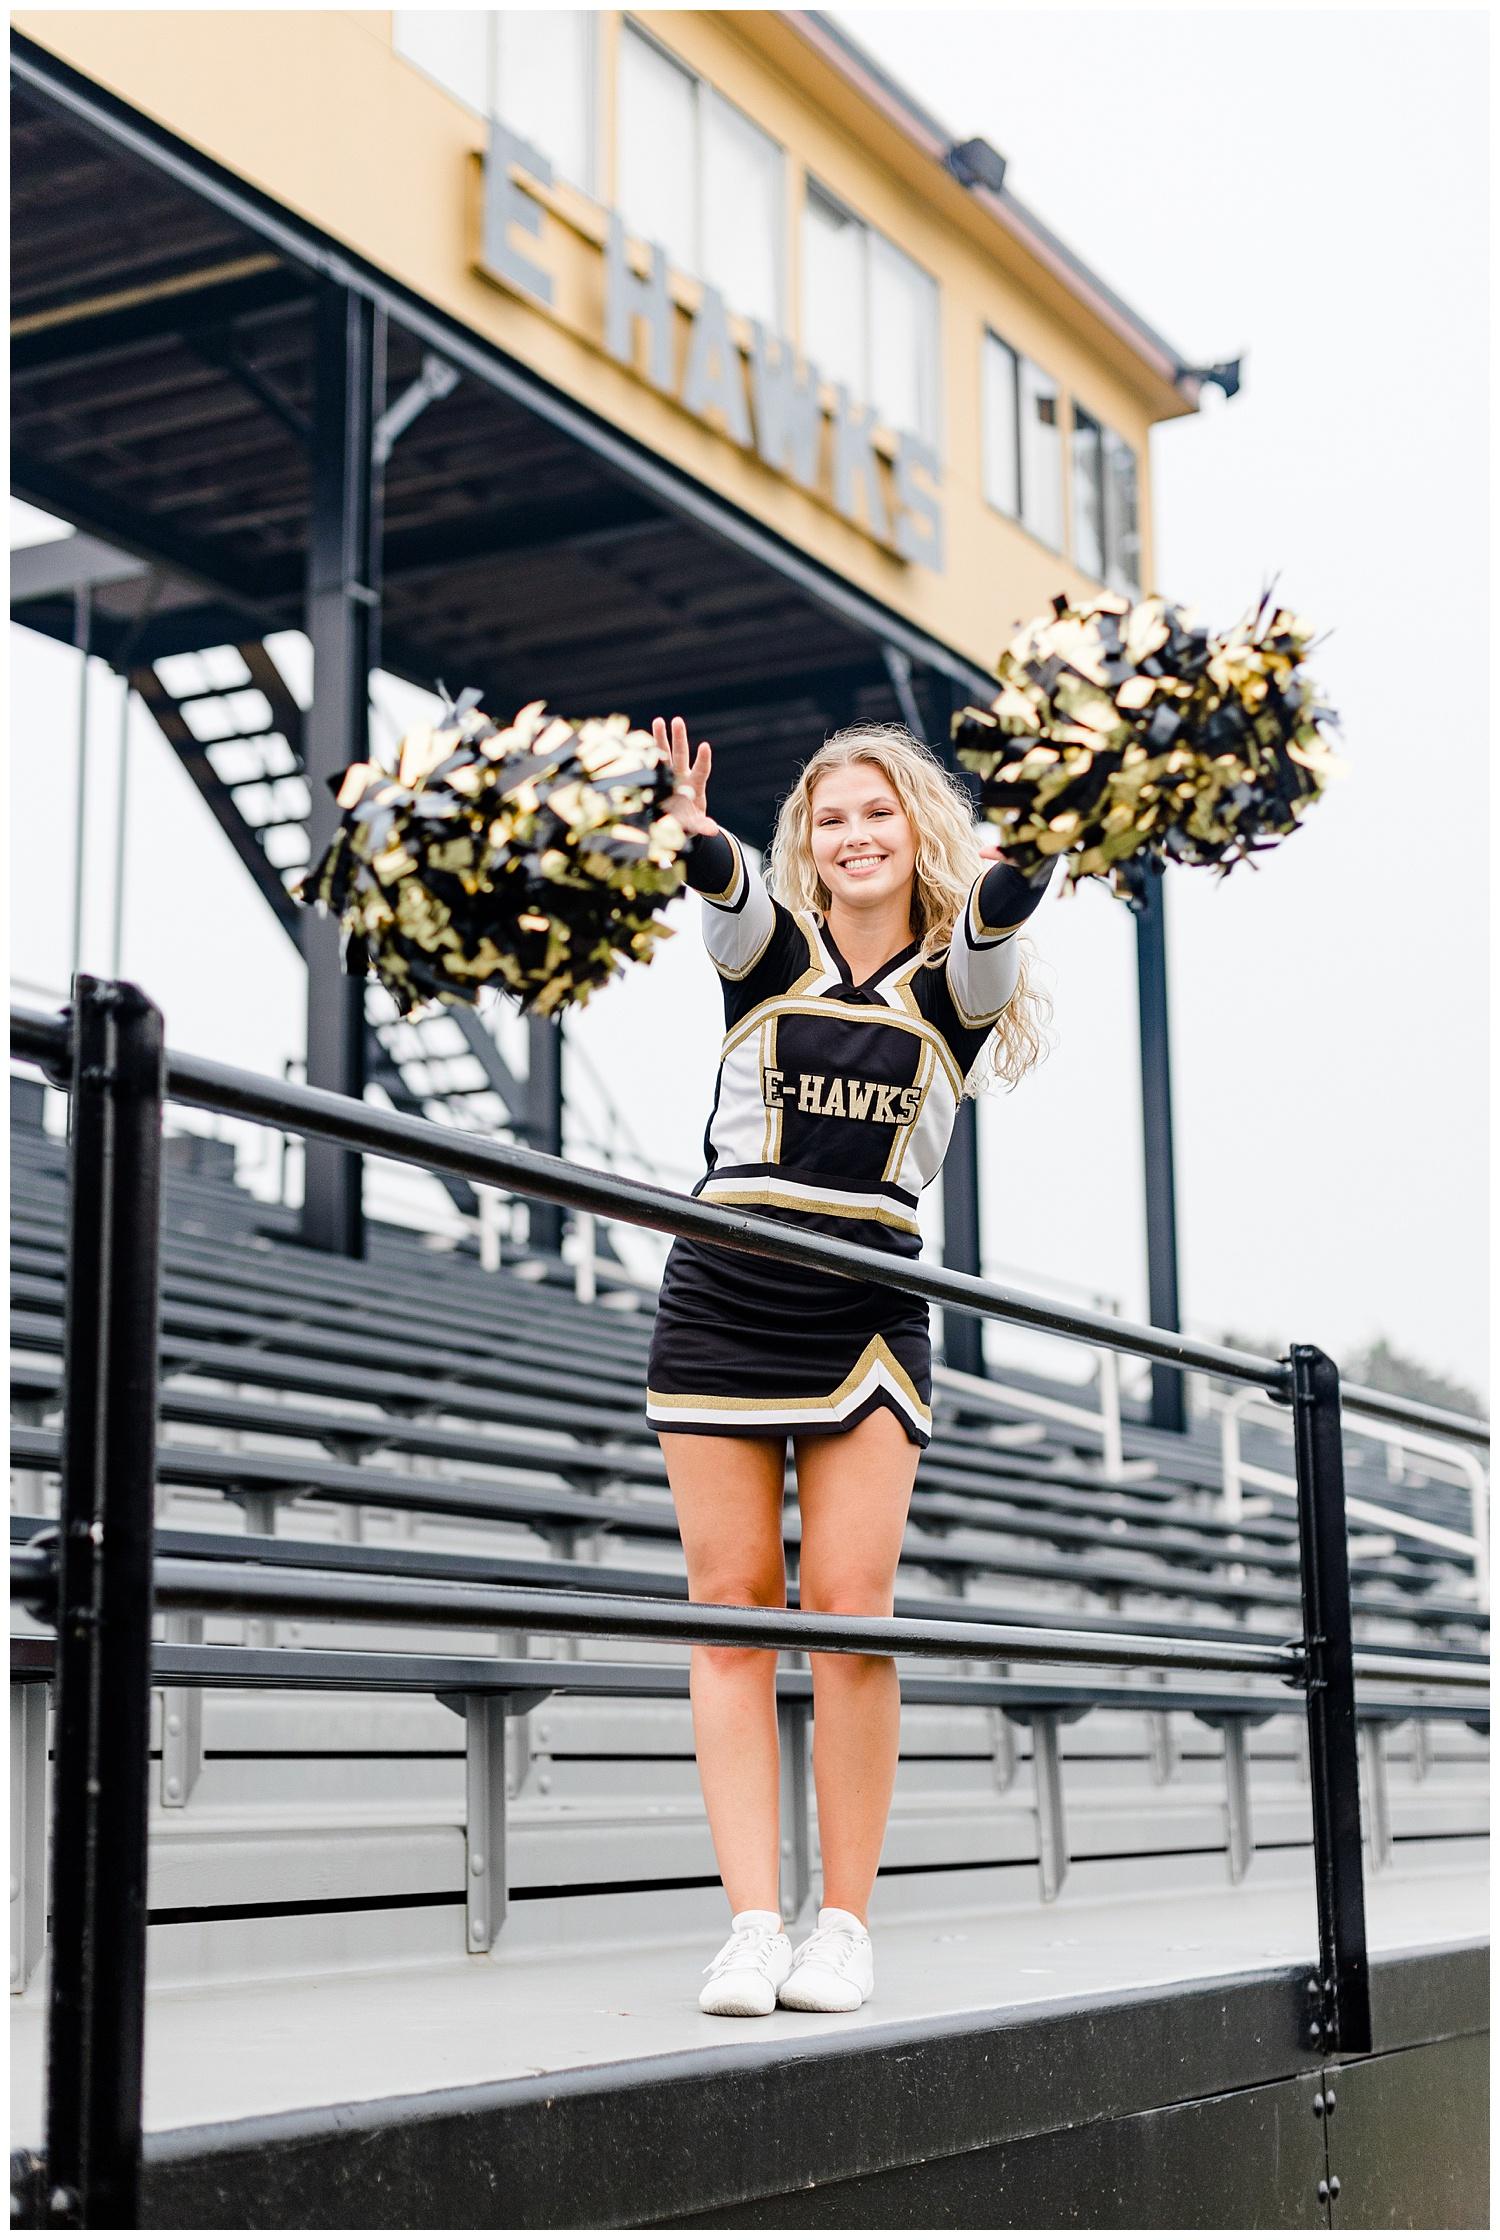 Senior Rachel from Emmetsburg High throws her cheerleading pows forward as she stands on the bleachers in the football field | CB Studio